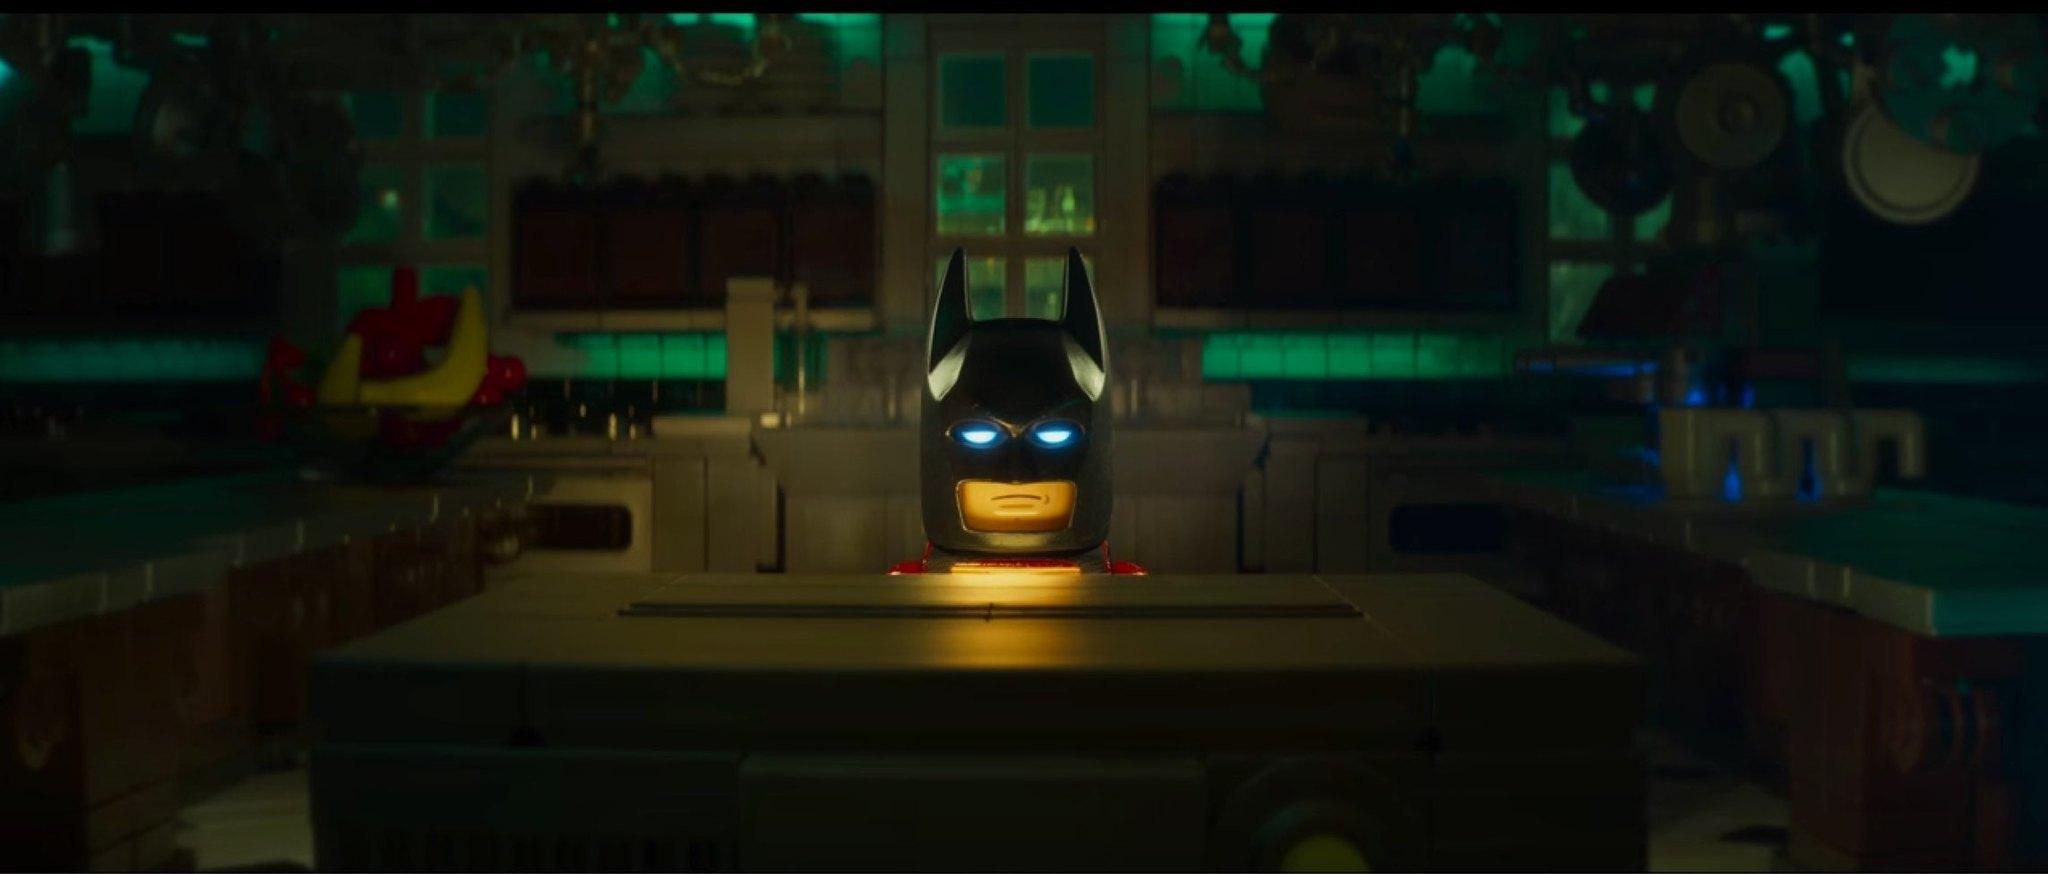 The Lego Batman Movie Free